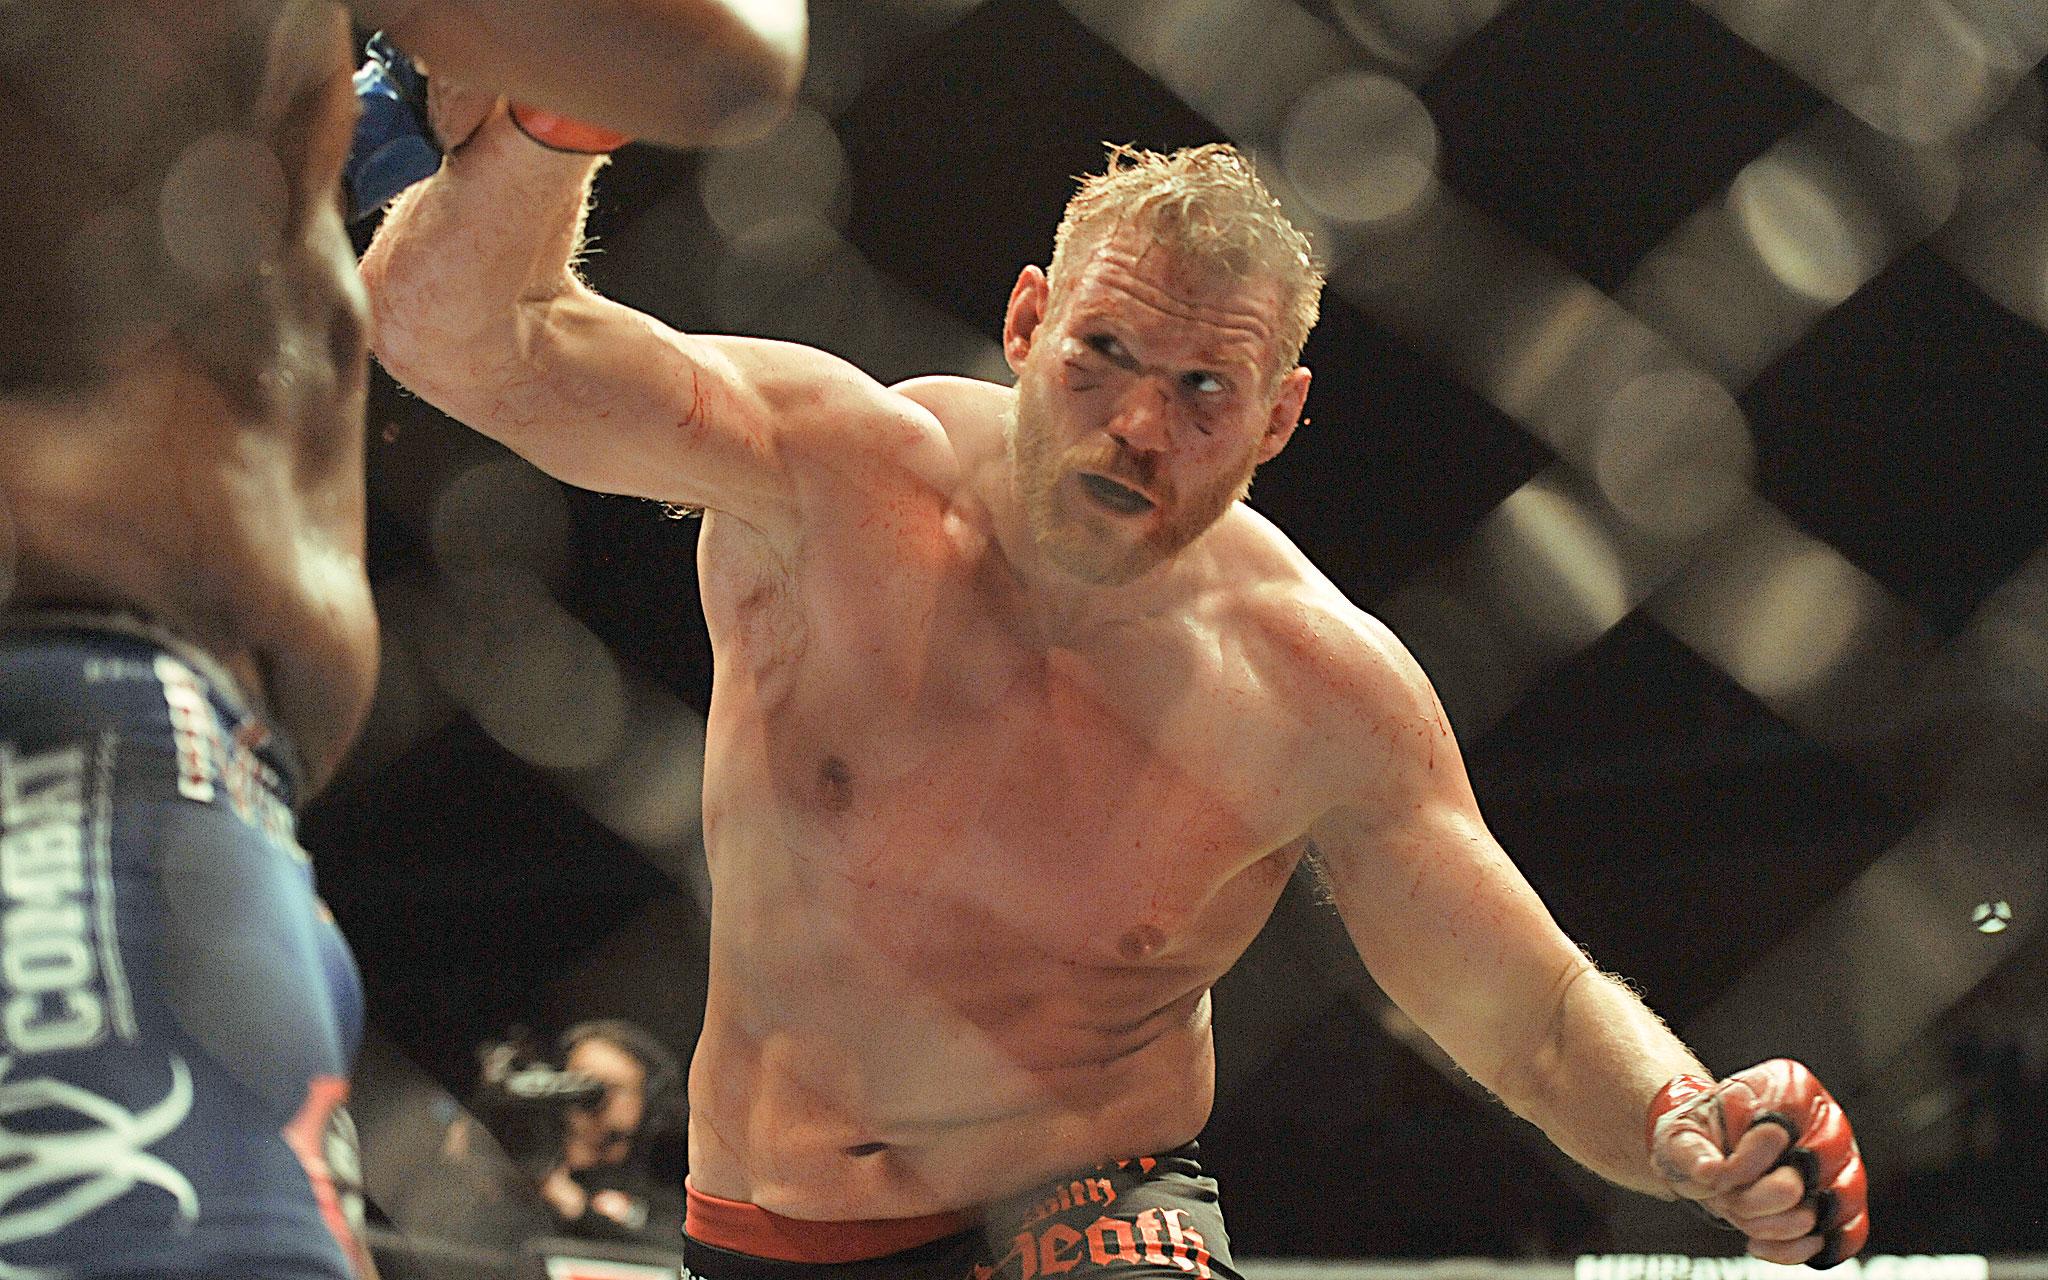 No. 3: Josh Barnett flunks a steroid test